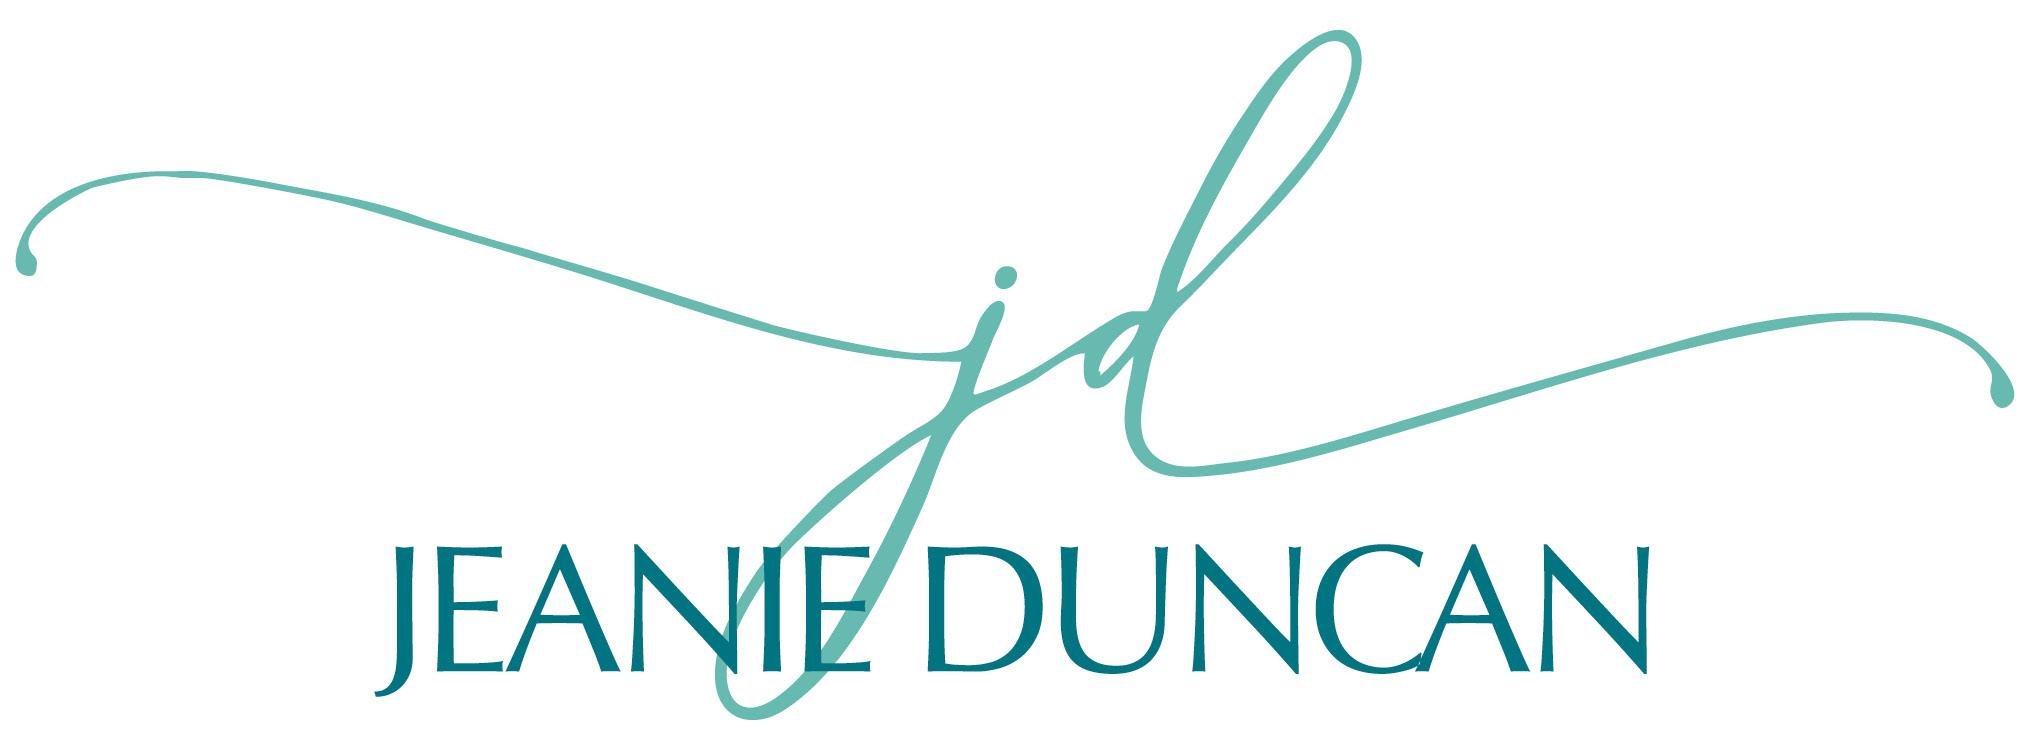 Jeanie Duncan